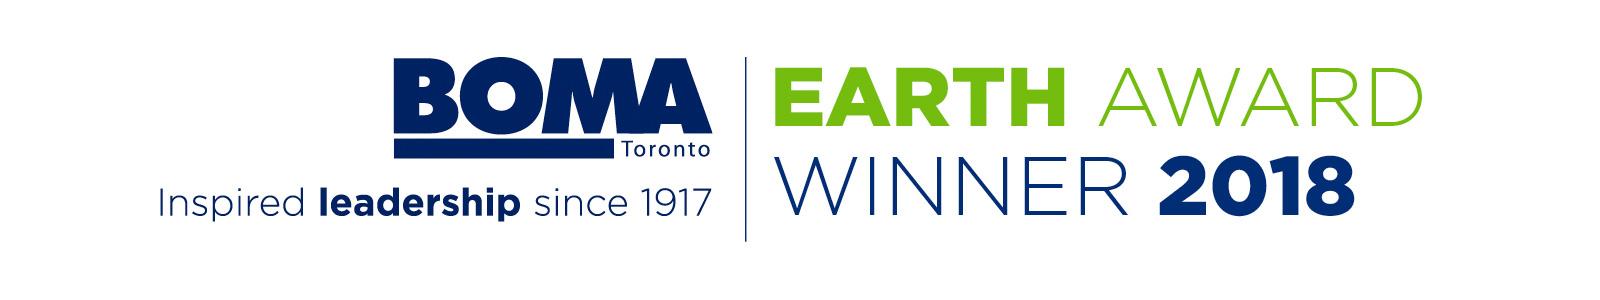 BOMA Toronto Earth Award